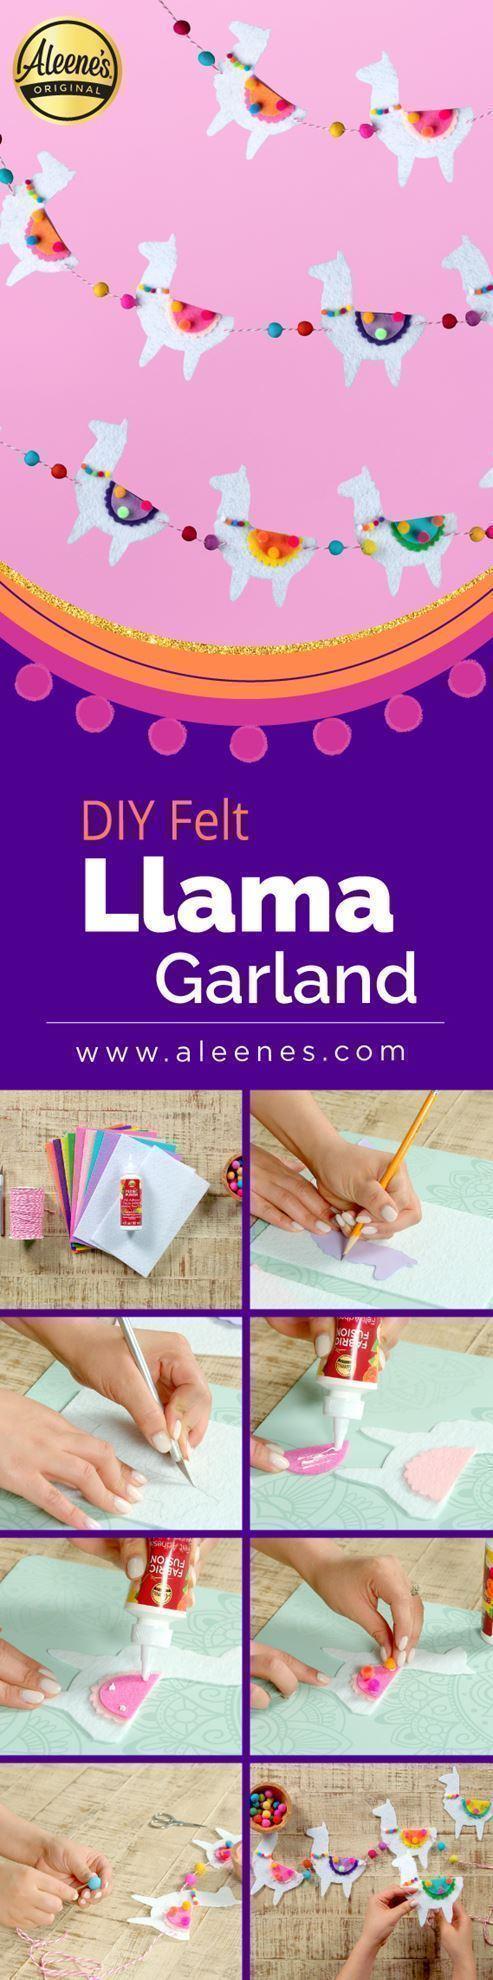 Aleene's DIY Felt Llama Garland